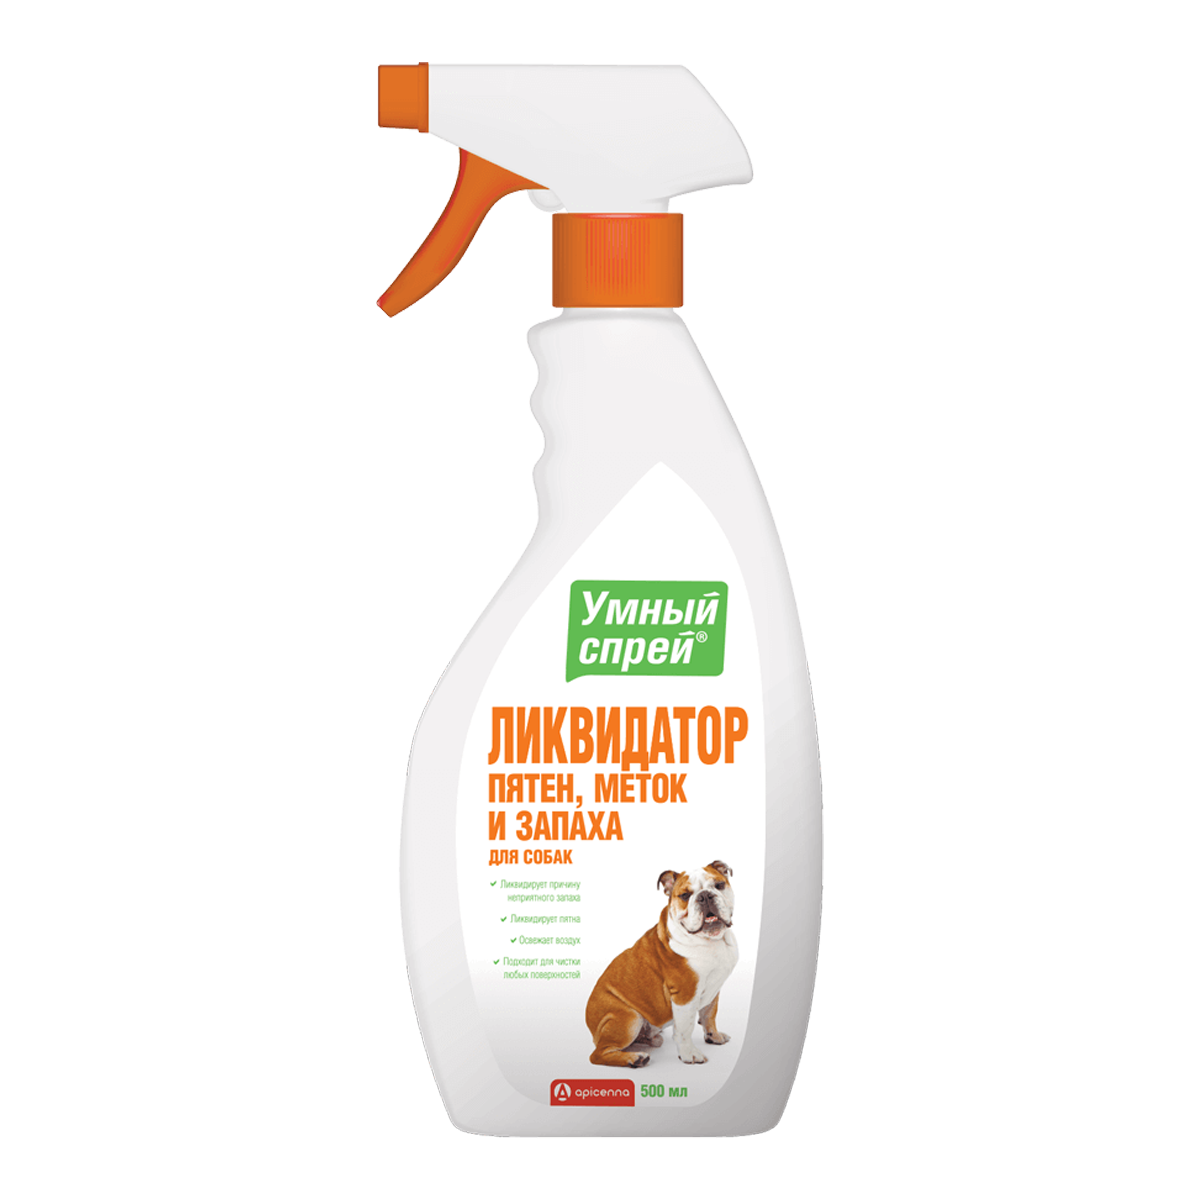 Умный Спрей Ликвидатор пятен, меток, запаха для собак, 500 мл